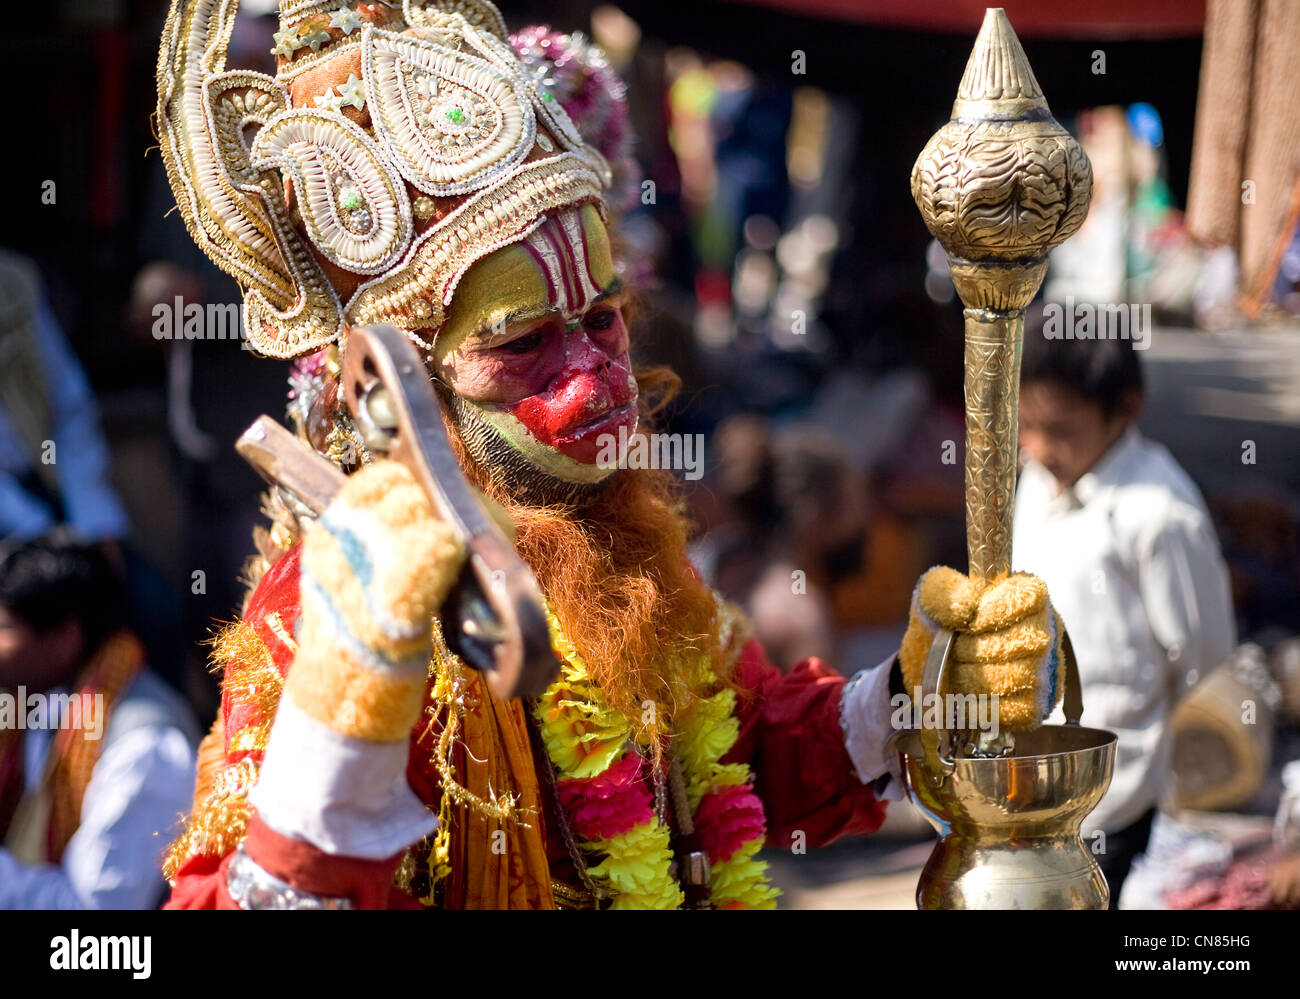 Man dressed as Hindu god Hanuman during Shivaratri  festival at Pashupatinath - Stock Image